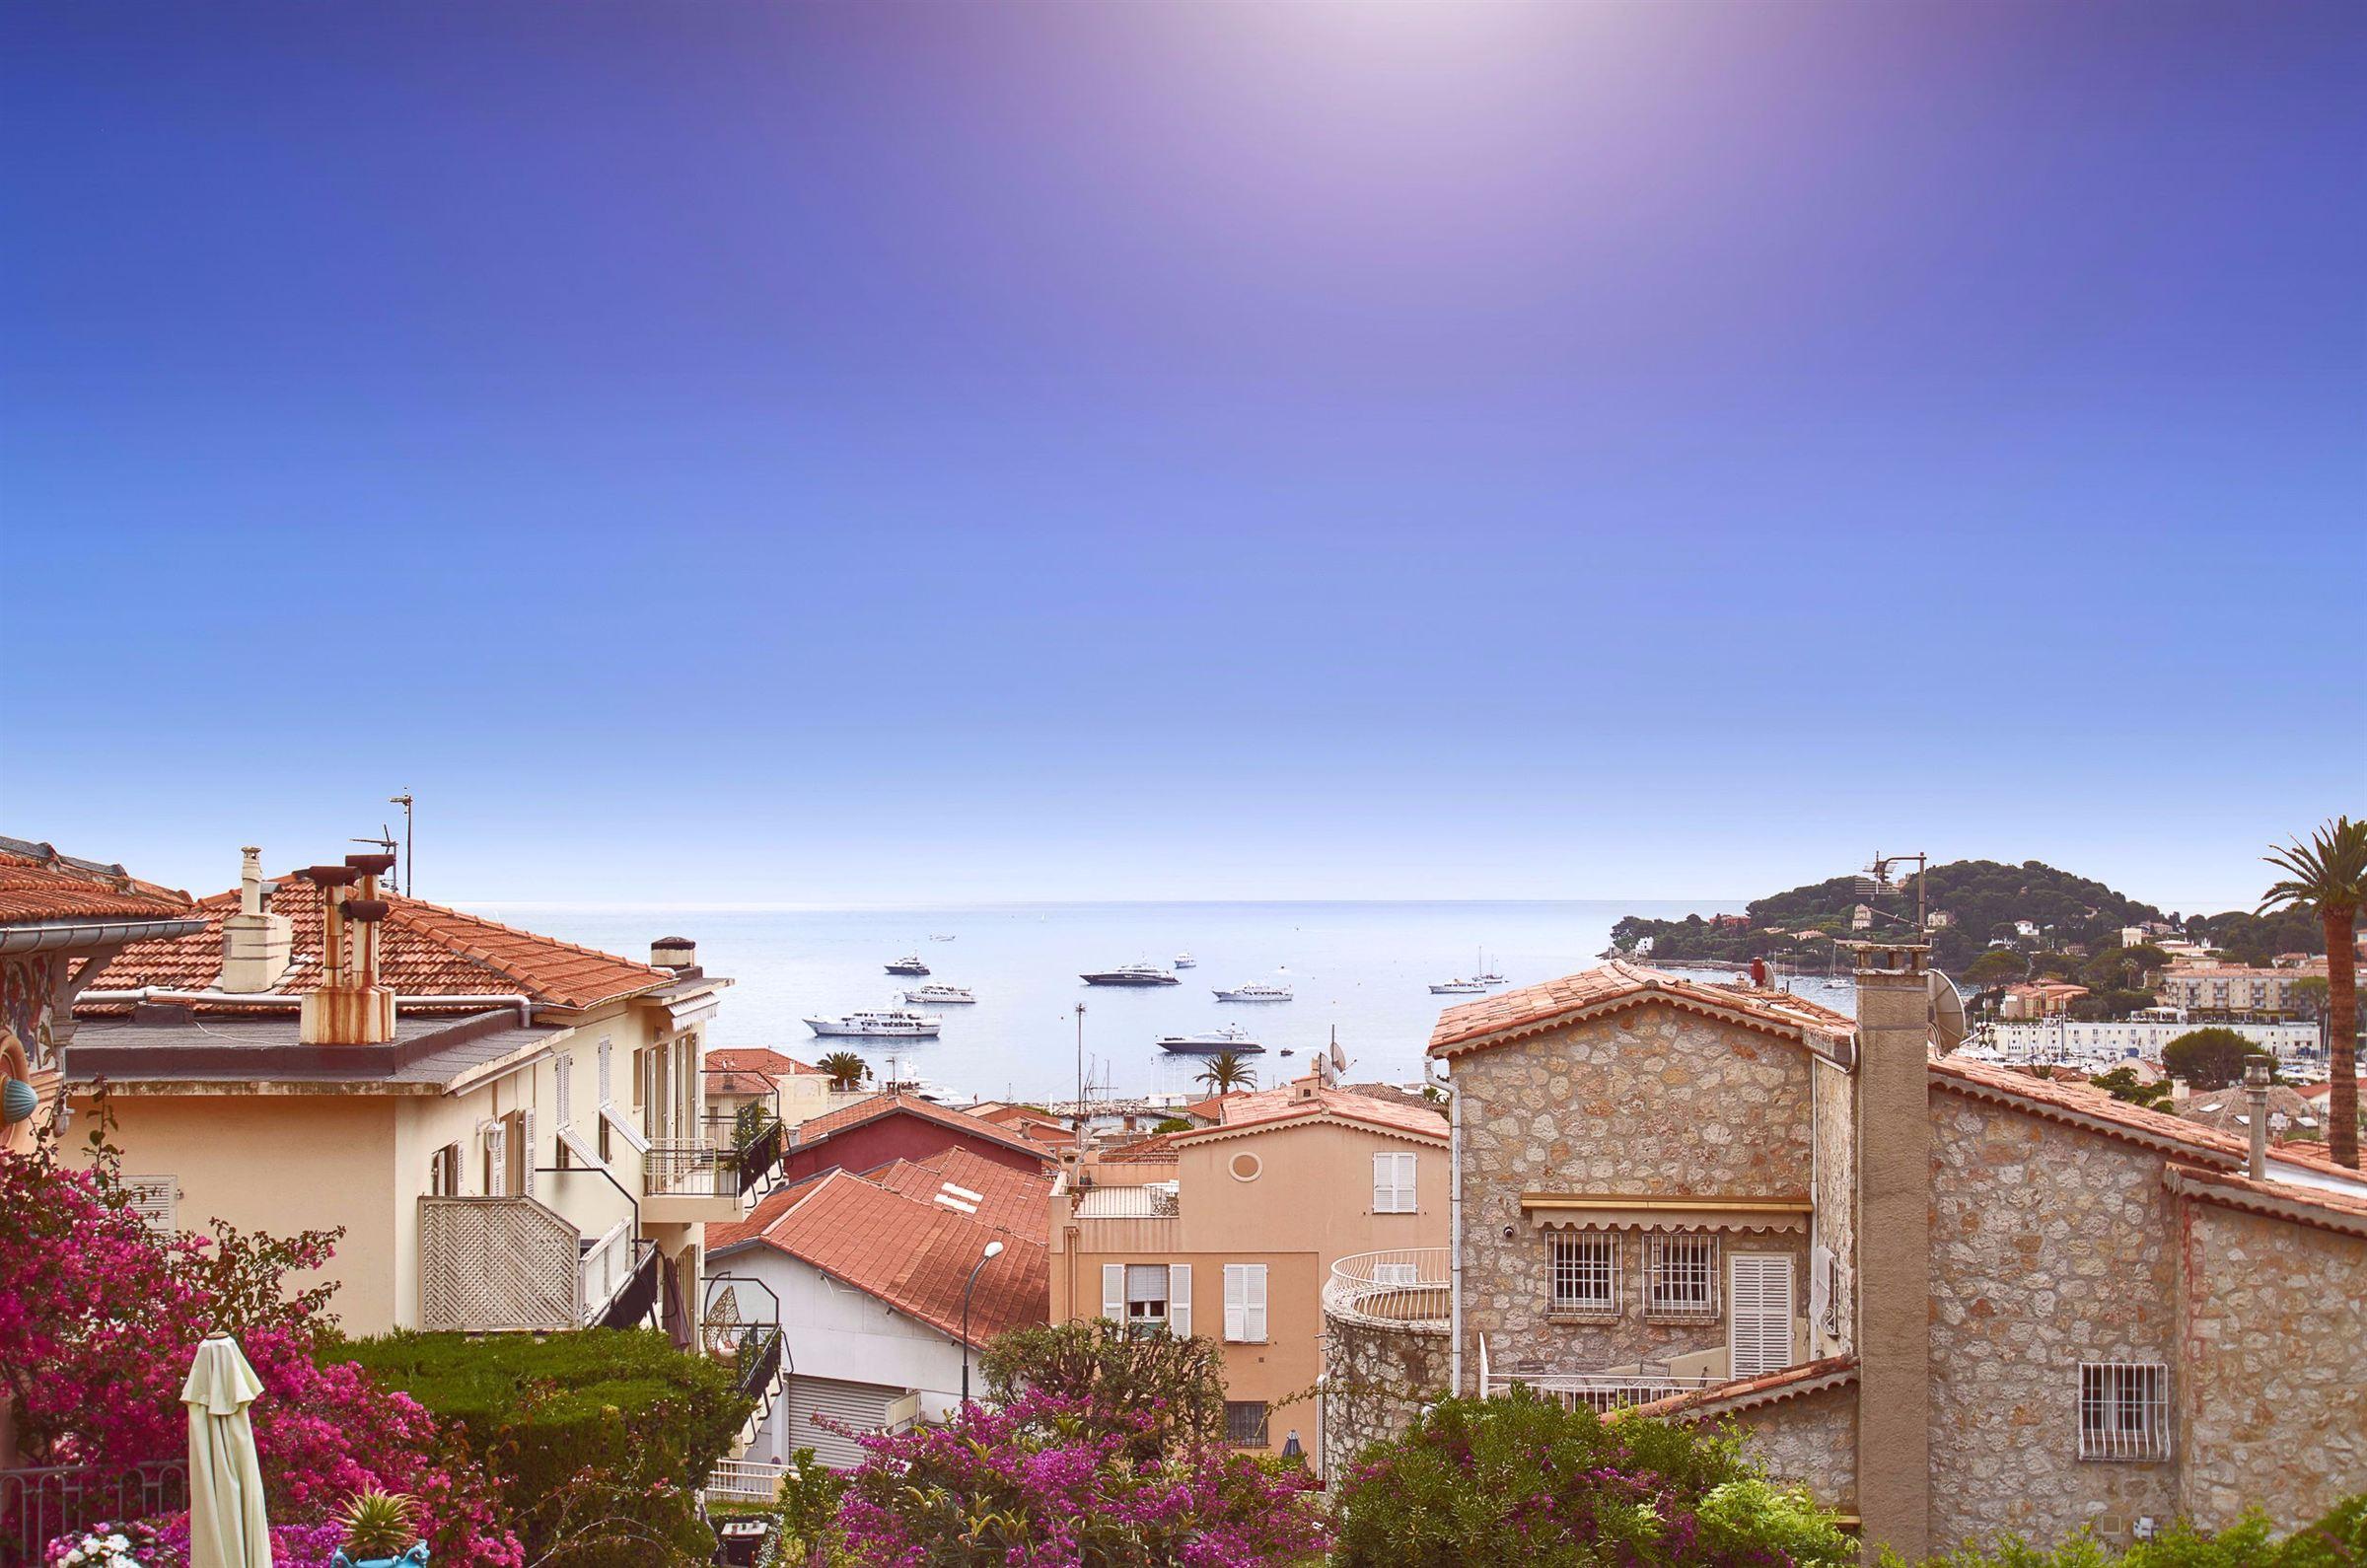 Apartamento por un Venta en Immaculate apartment of 95m² with sea views for sale St Jean Cap Ferrat Other Provence-Alpes-Cote D'Azur, Provincia - Alpes - Costa Azul, 06230 Francia